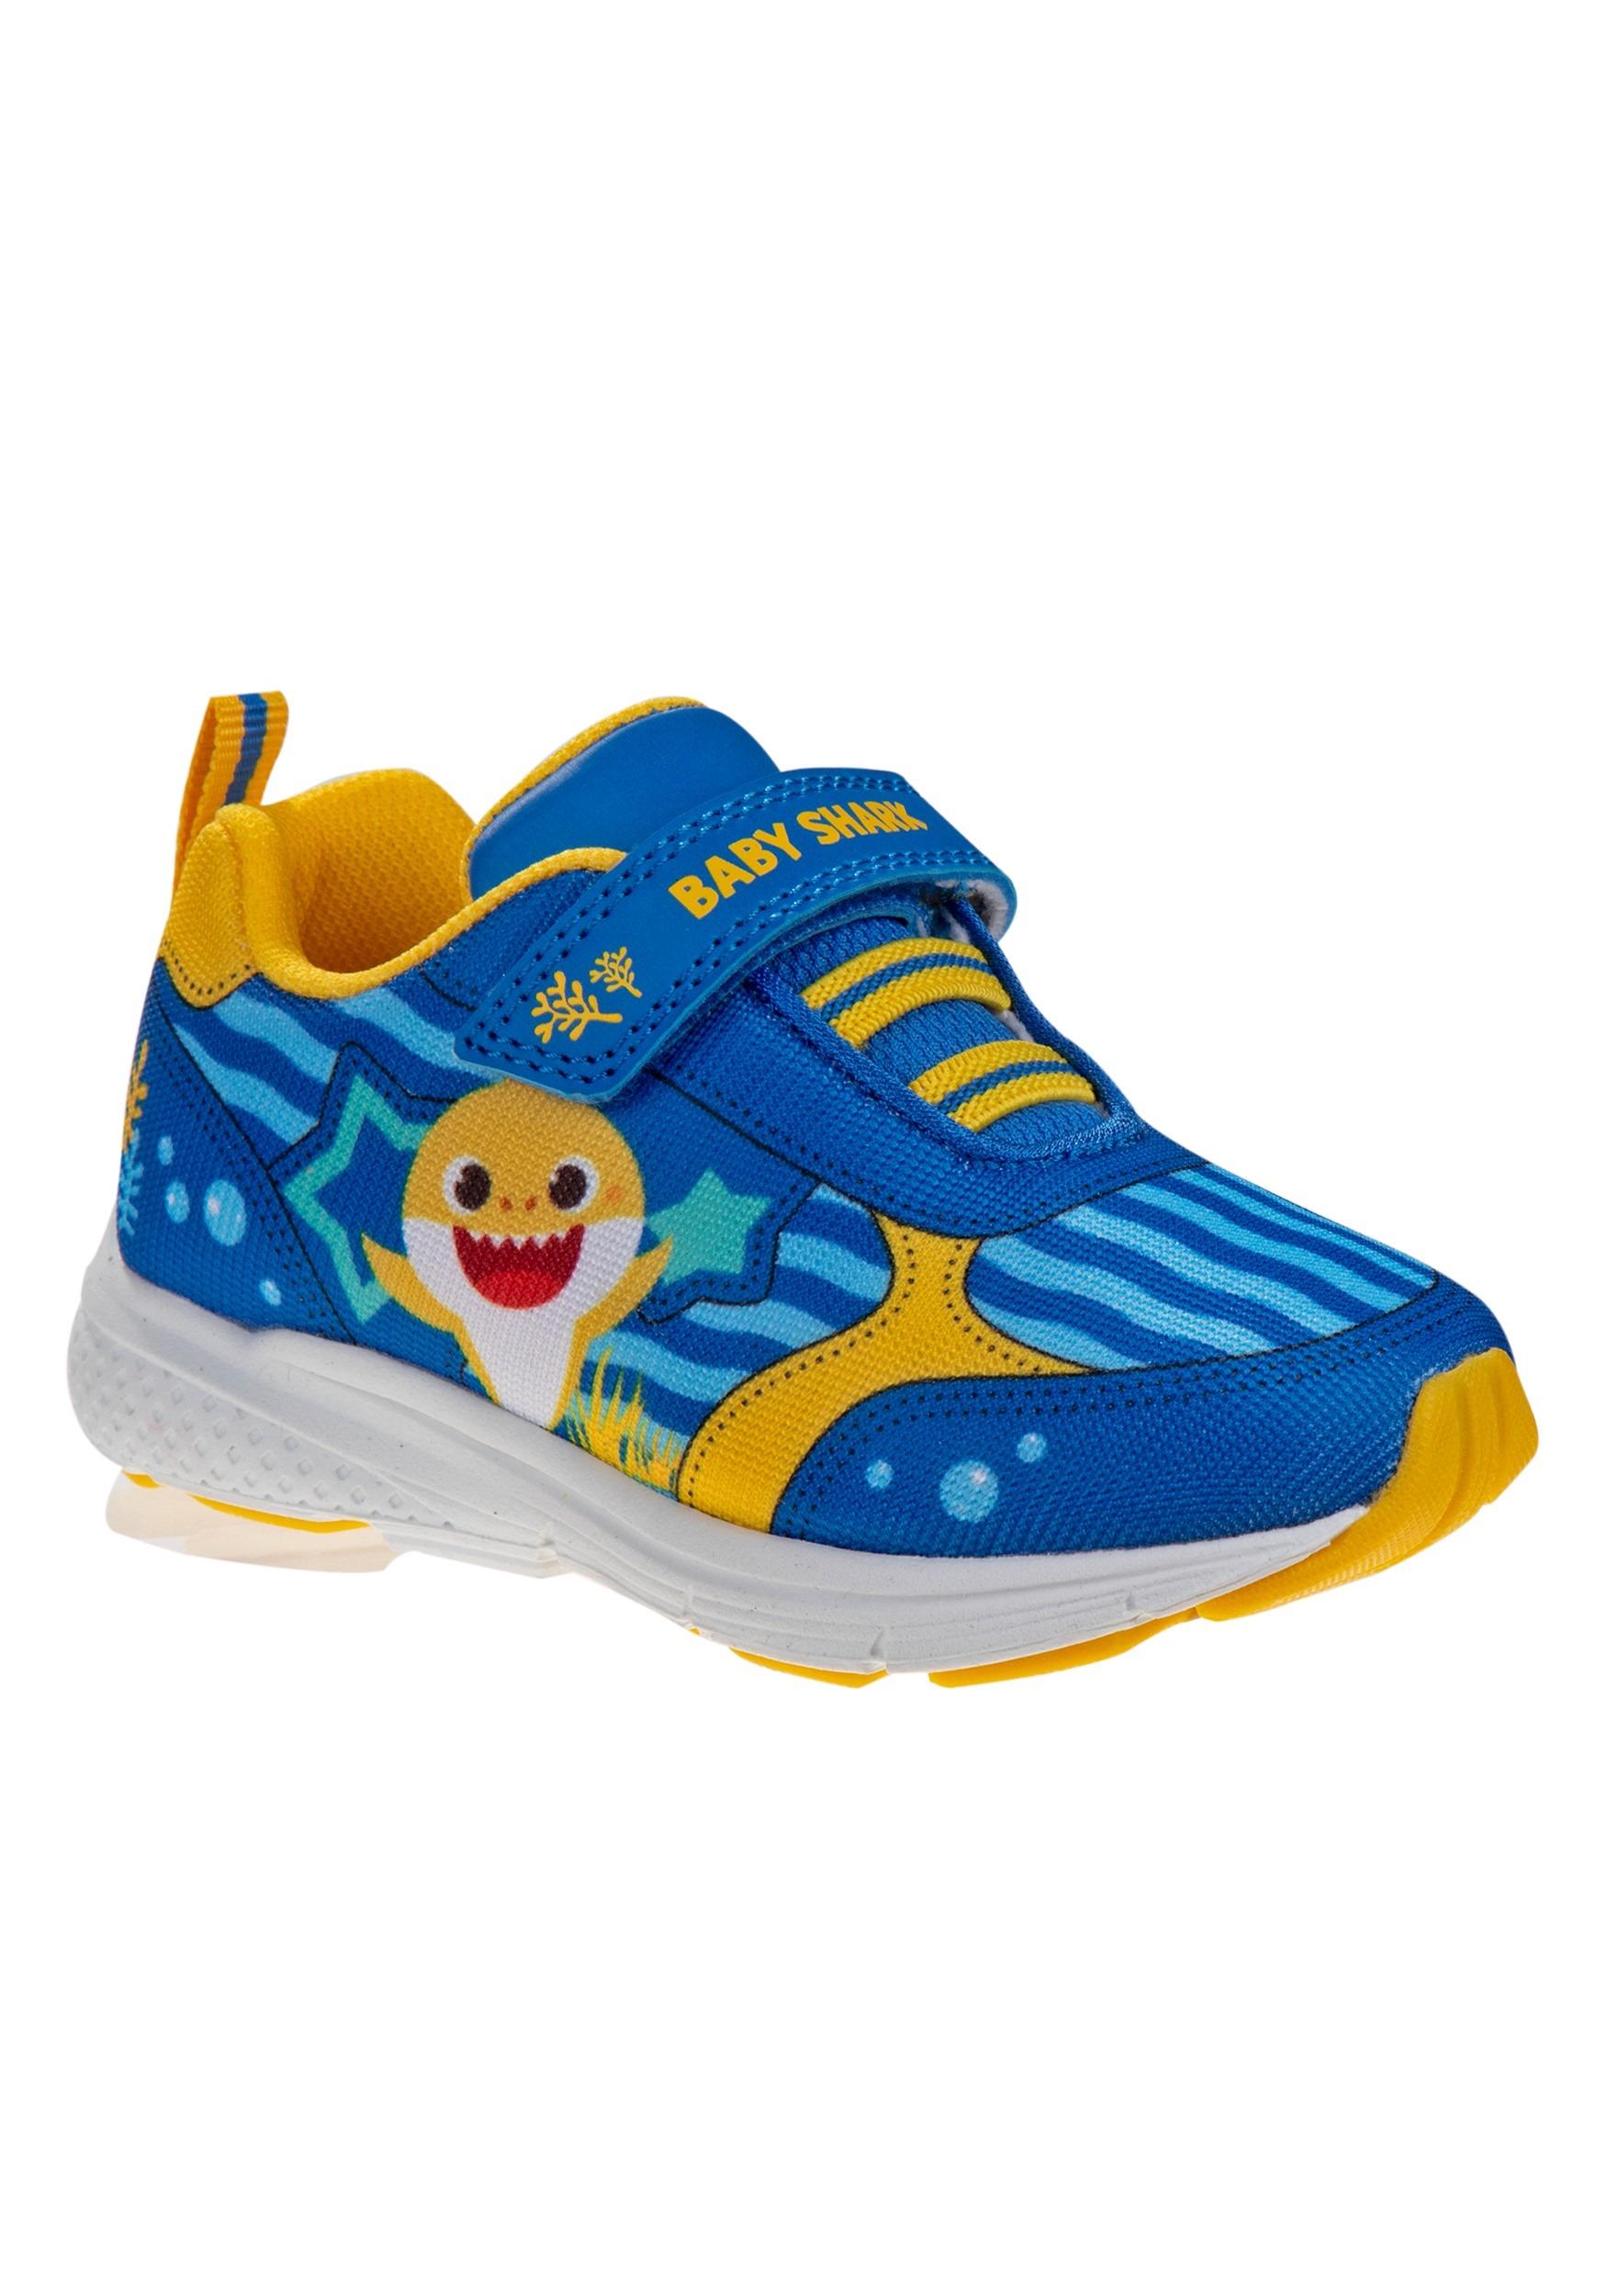 Pinkfong Baby Shark sneaker for Kids